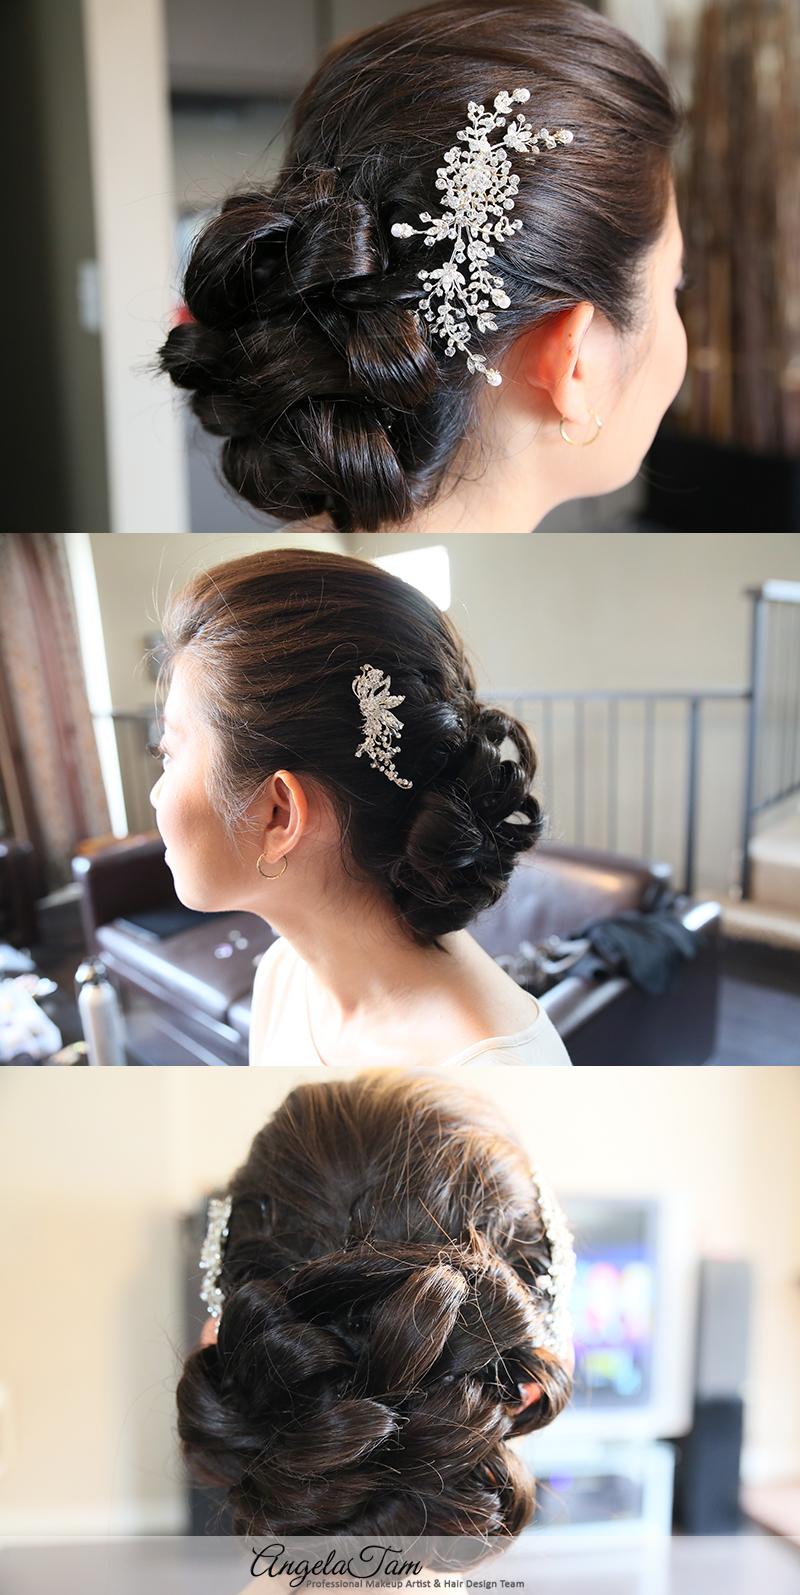 San Diego Wedding Asian Bridal Makeup Artist And Hair Stylist